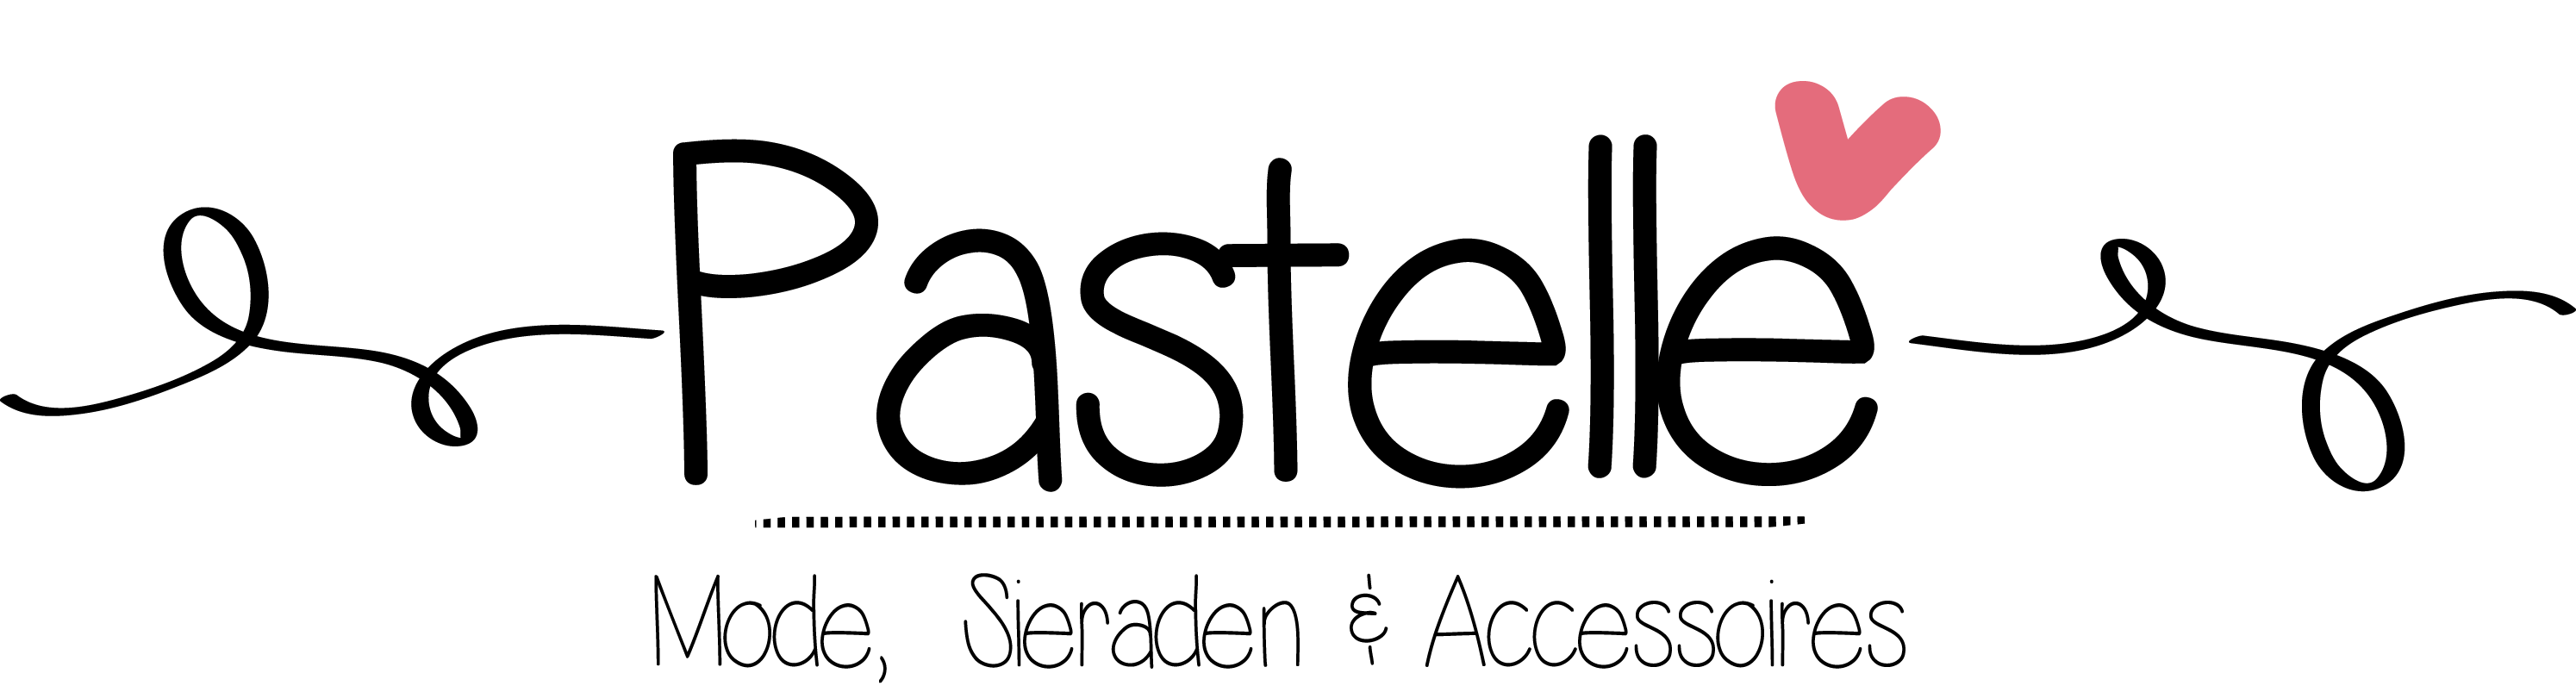 Pastelle logo - Mode, Sieraden en Accessoires